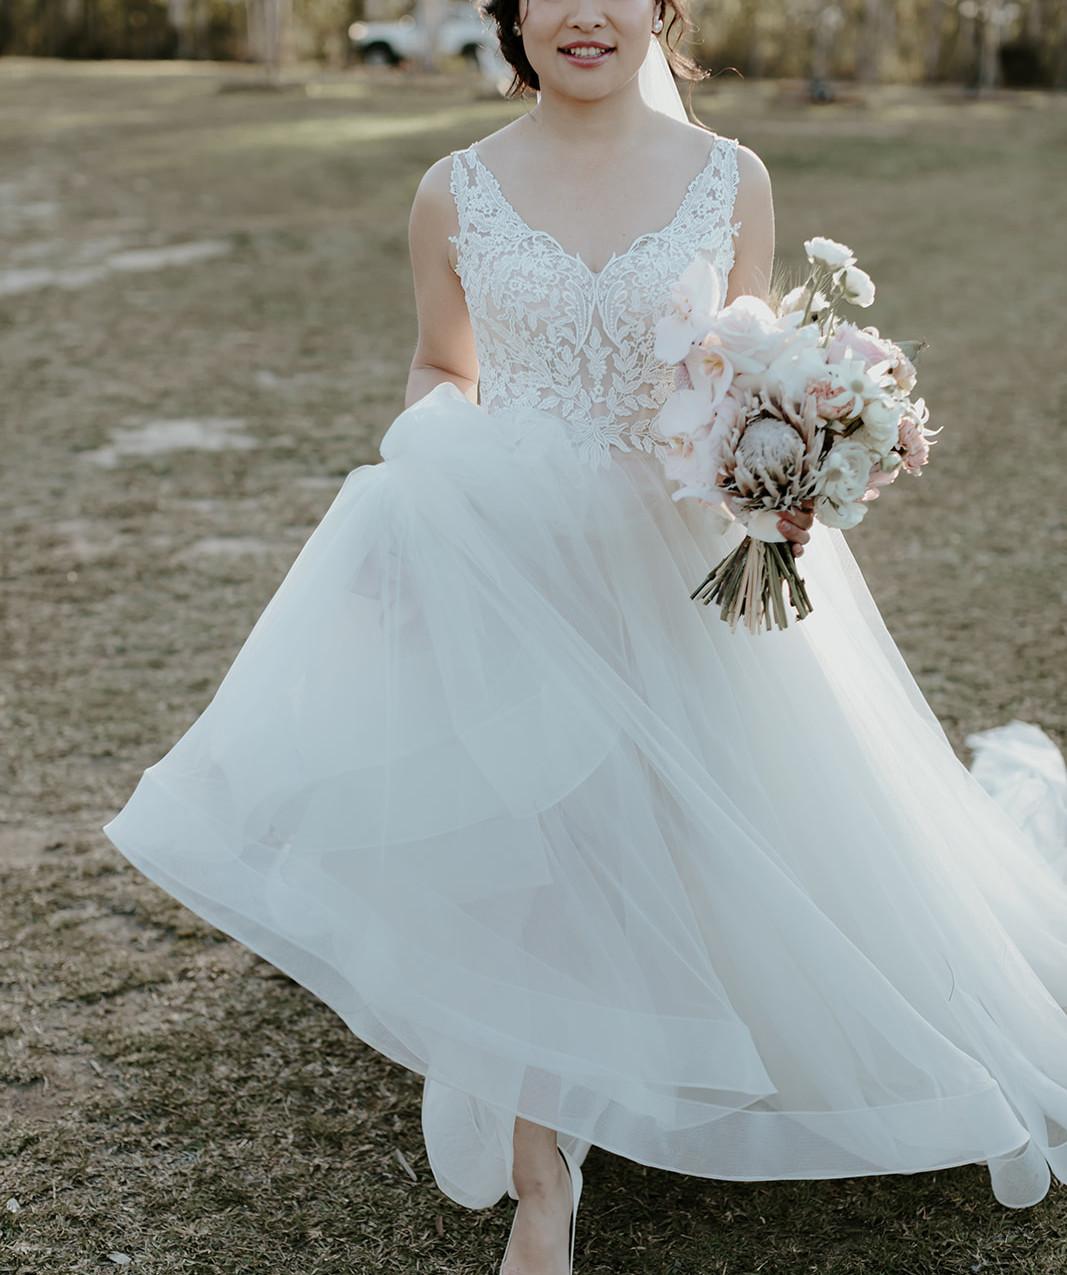 Wedding Makeup Artist Sydney  Photography: Zoe Morley Photography